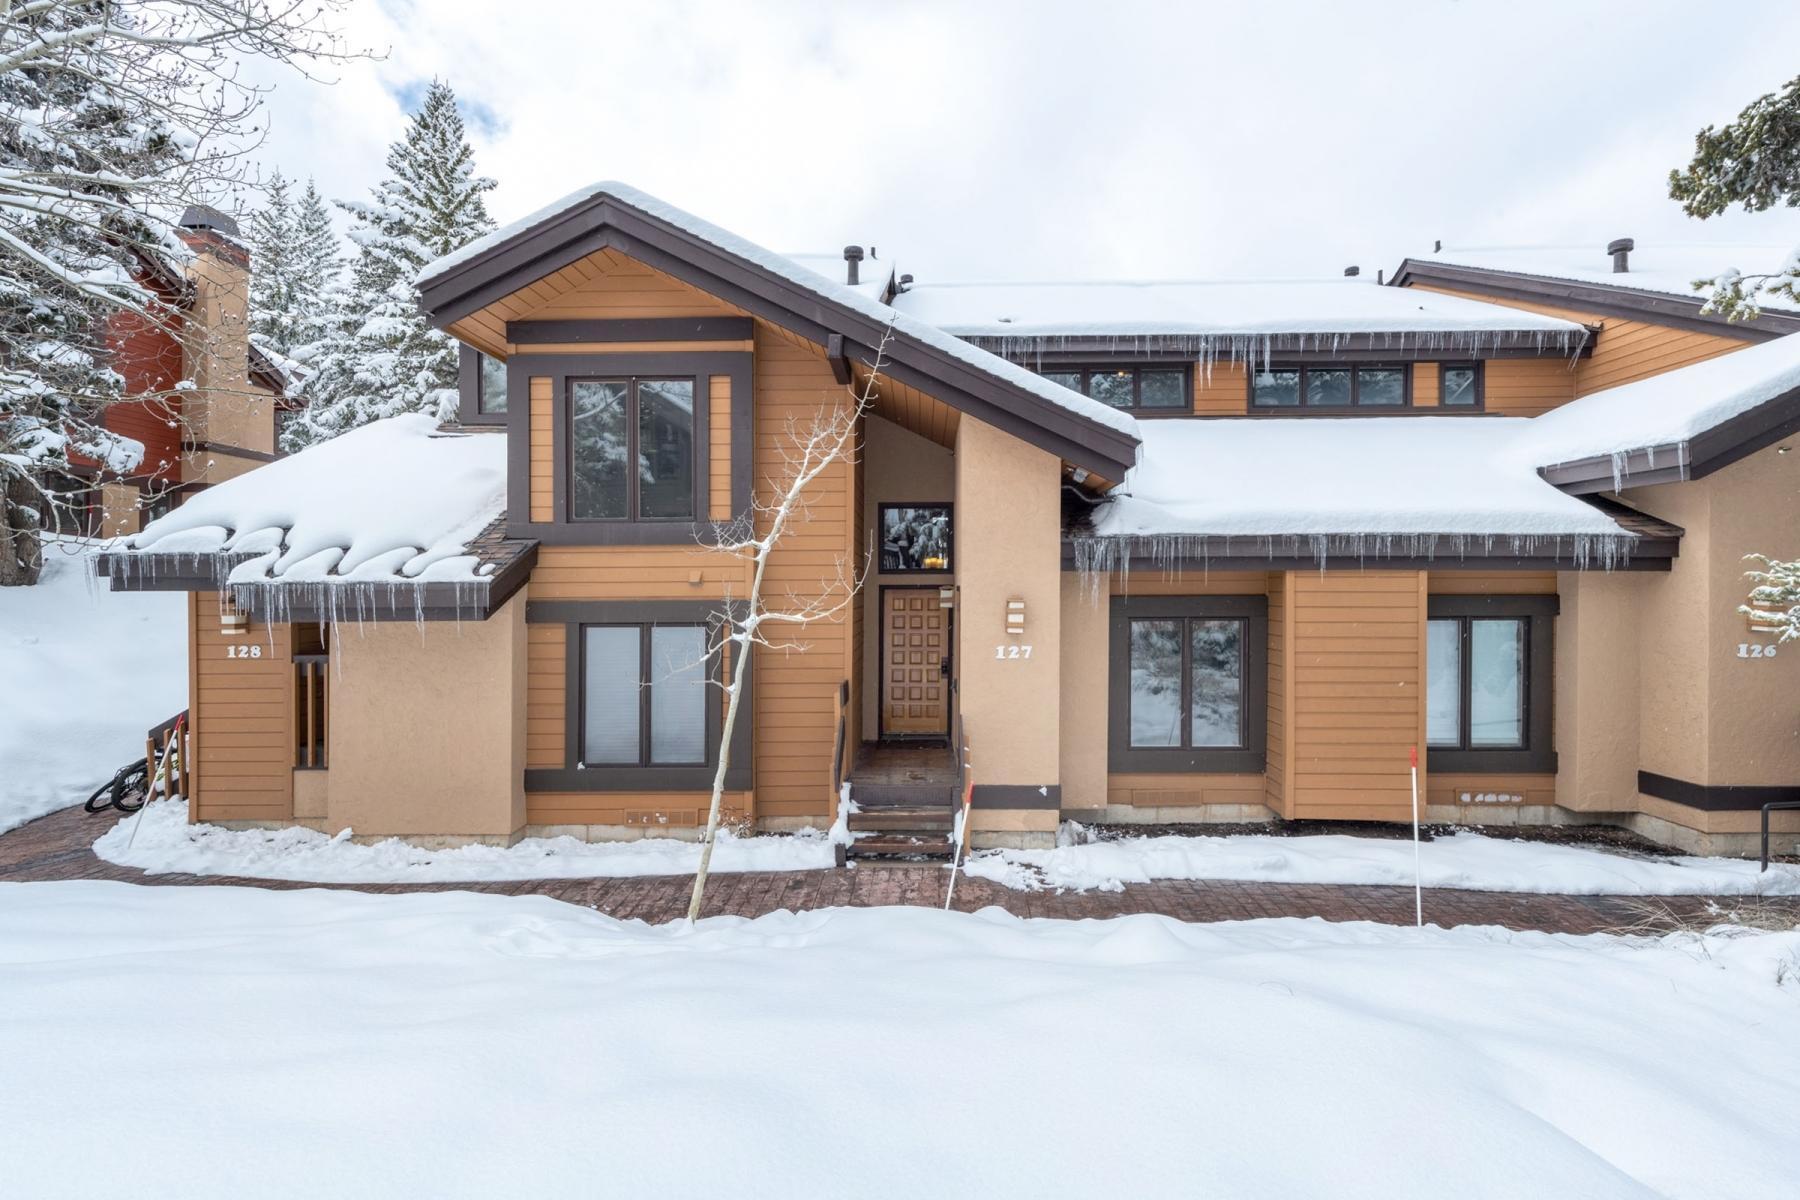 7986 Ridgepoint Drive, Park City, Utah 84060, 3 Bedrooms Bedrooms, ,2 BathroomsBathrooms,Condominium,For Sale,Ridgepoint,12101477